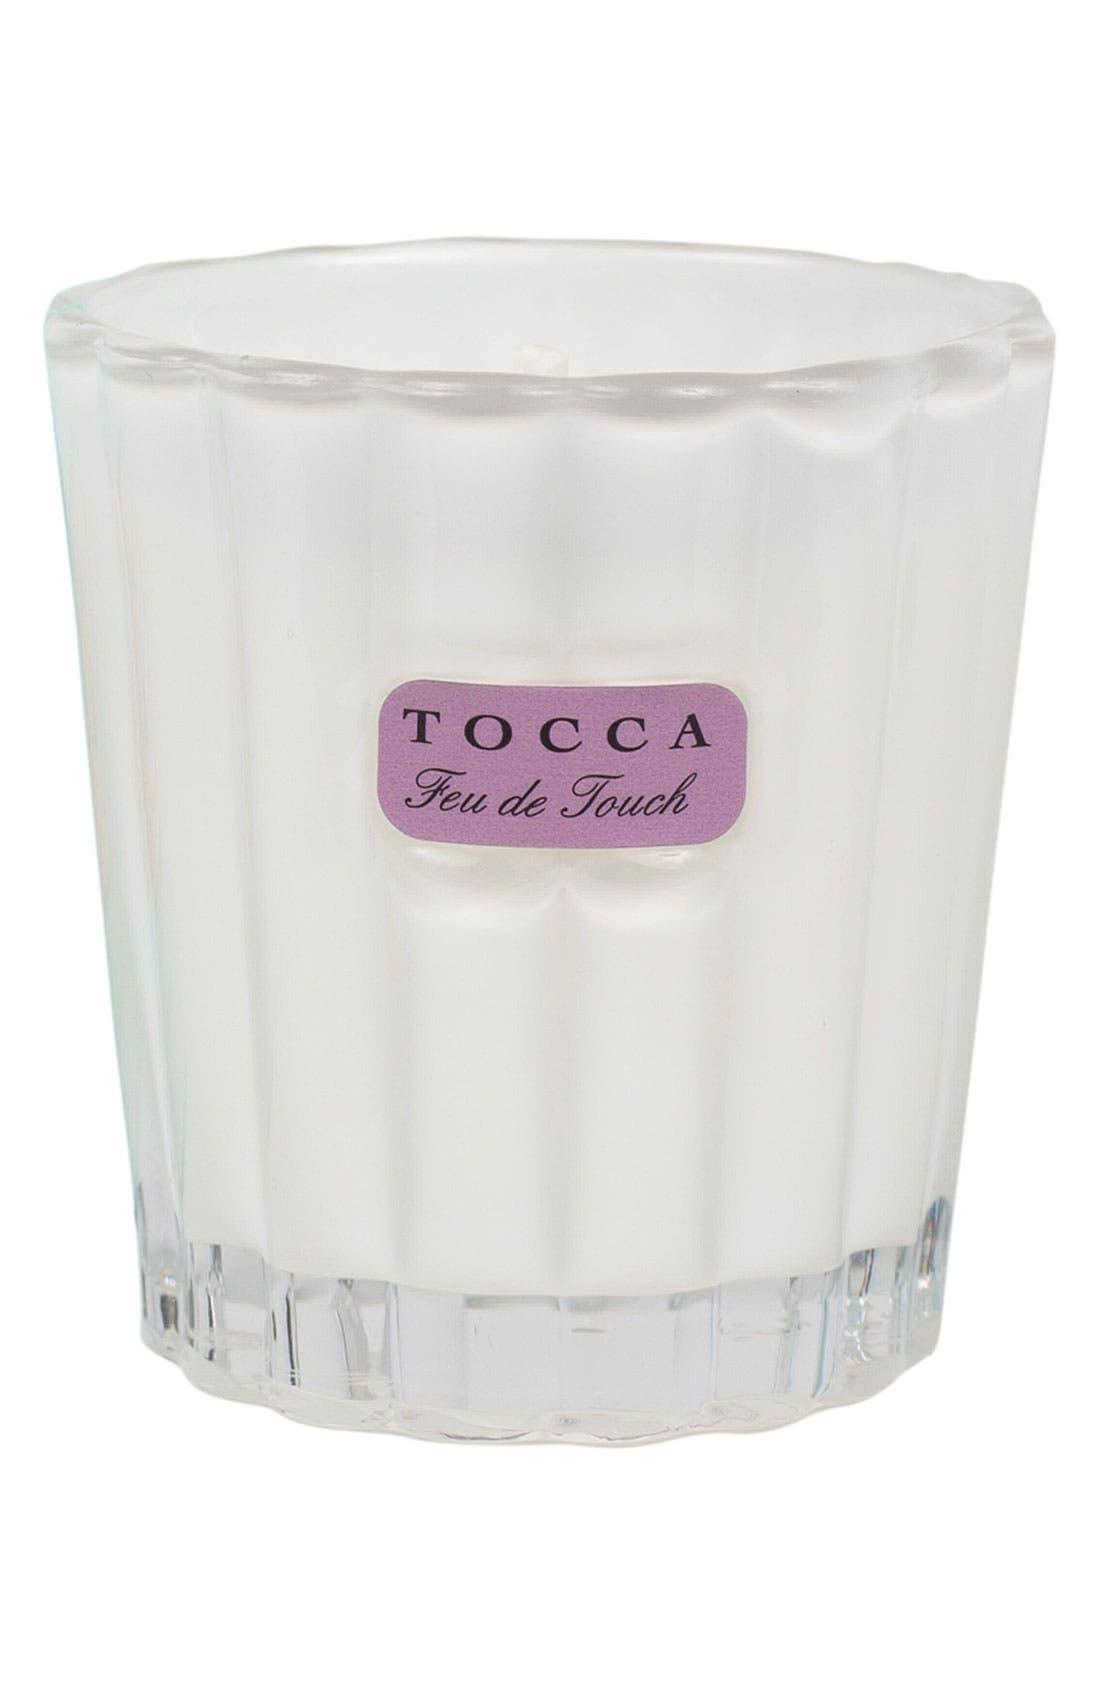 Main Image - TOCCA 'Feu de Touch' Candelina